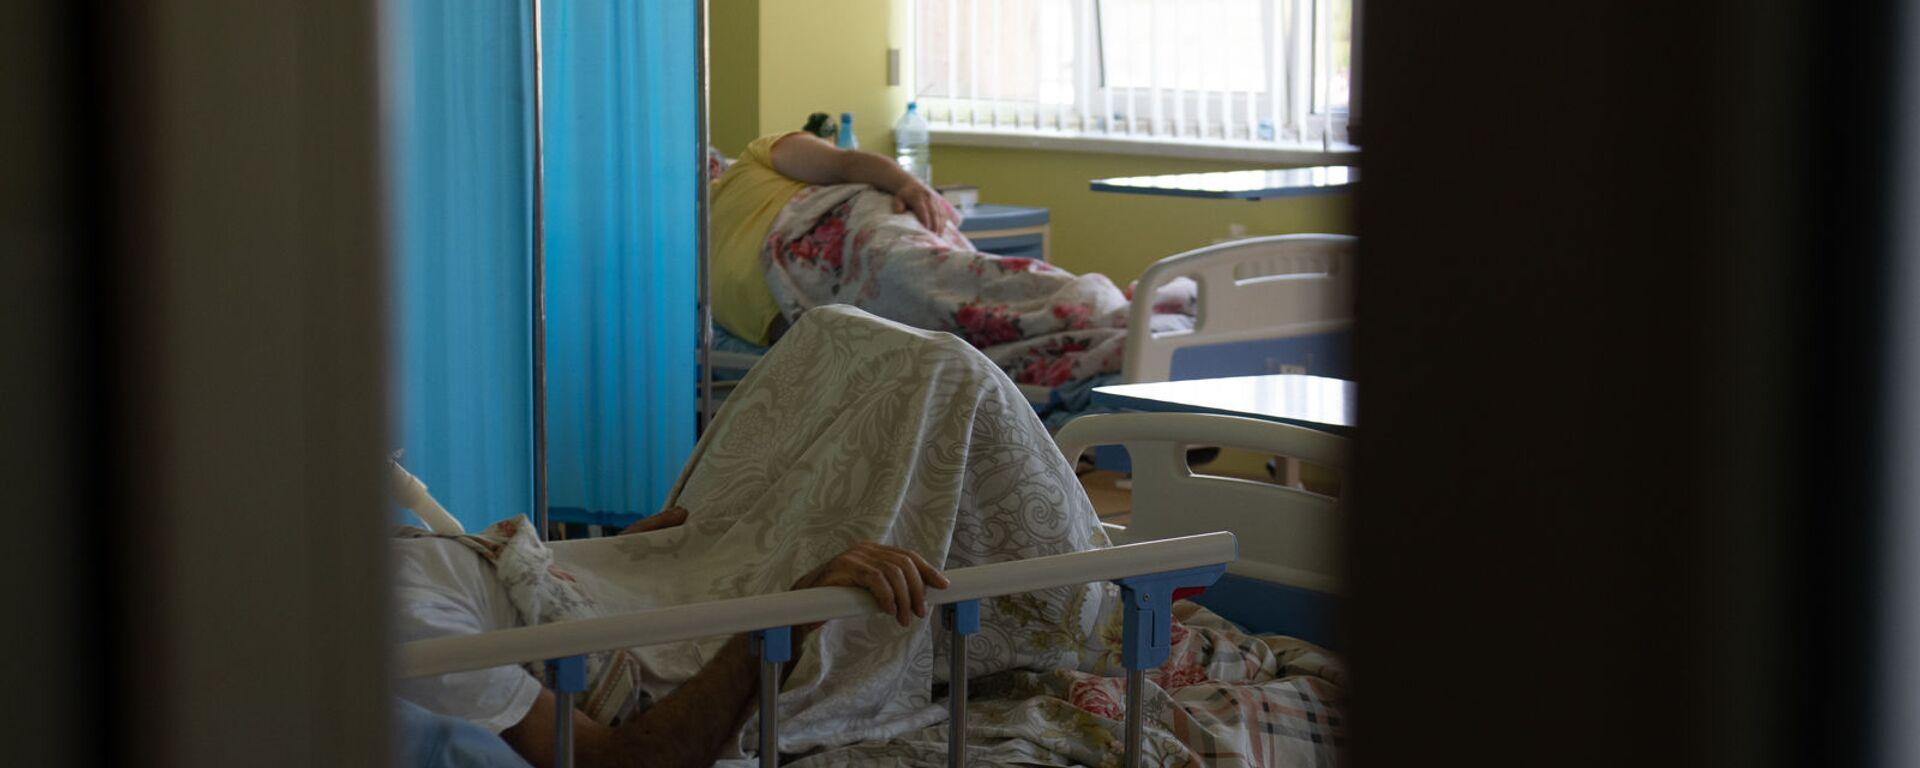 Пациенты в реанимации медцентра Арташат - Sputnik Армения, 1920, 22.09.2021